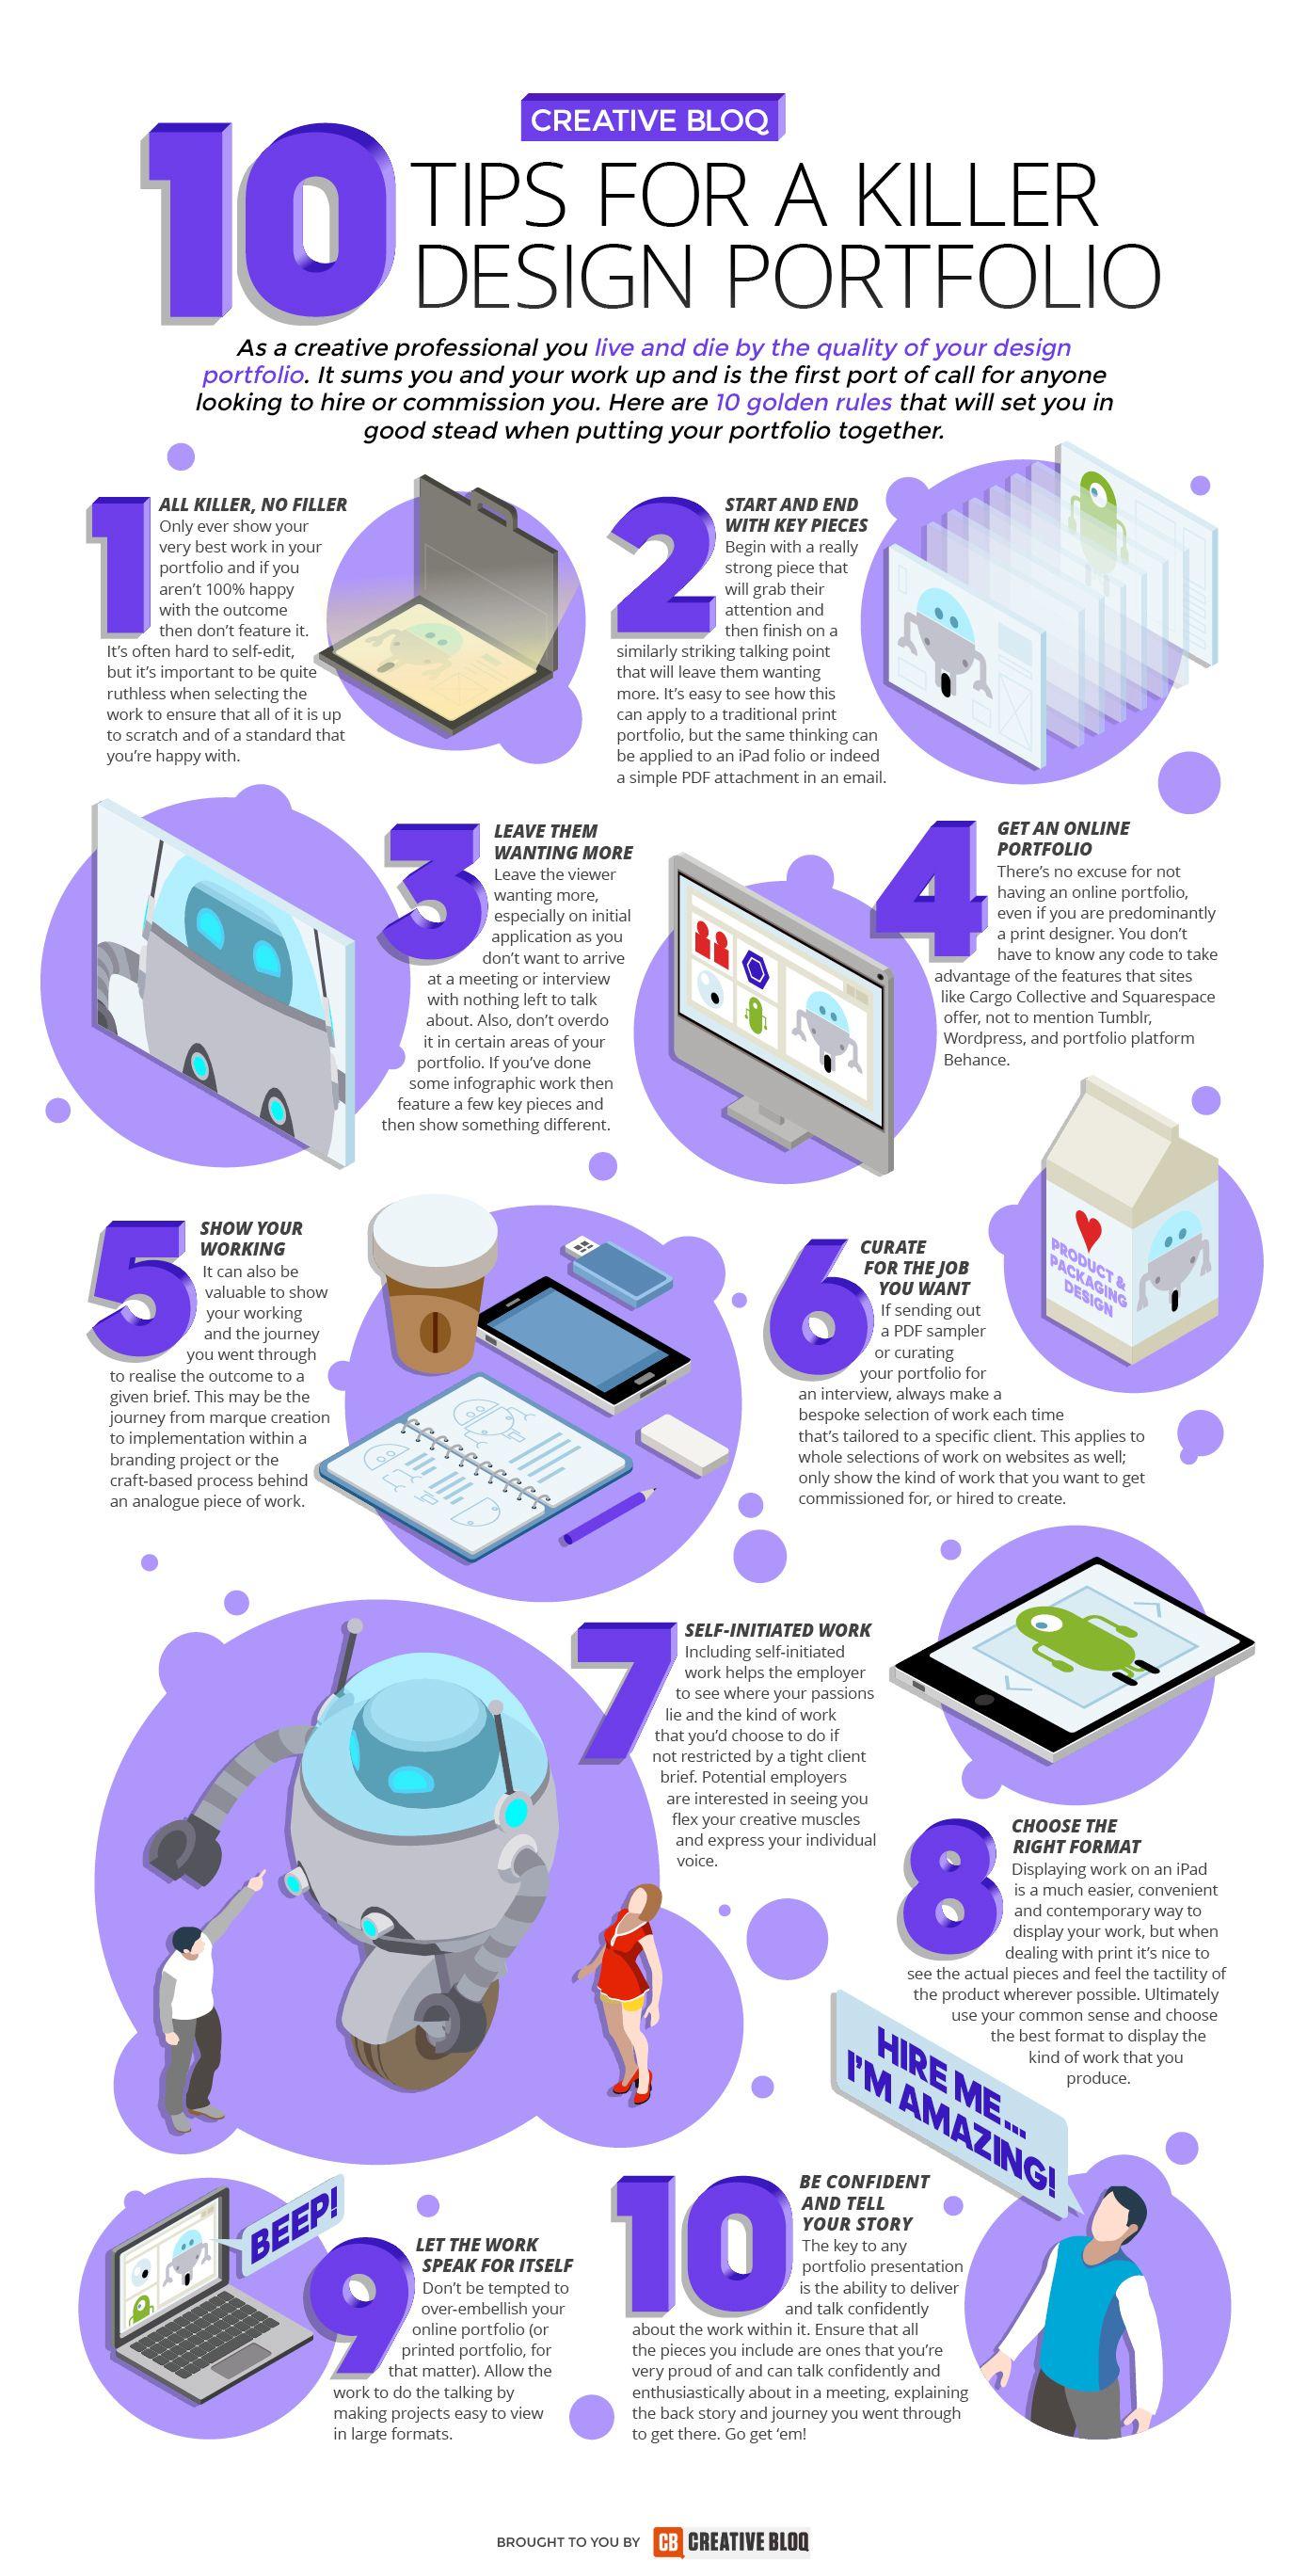 10 Tips For A Killer Design Portfolio - #infographic